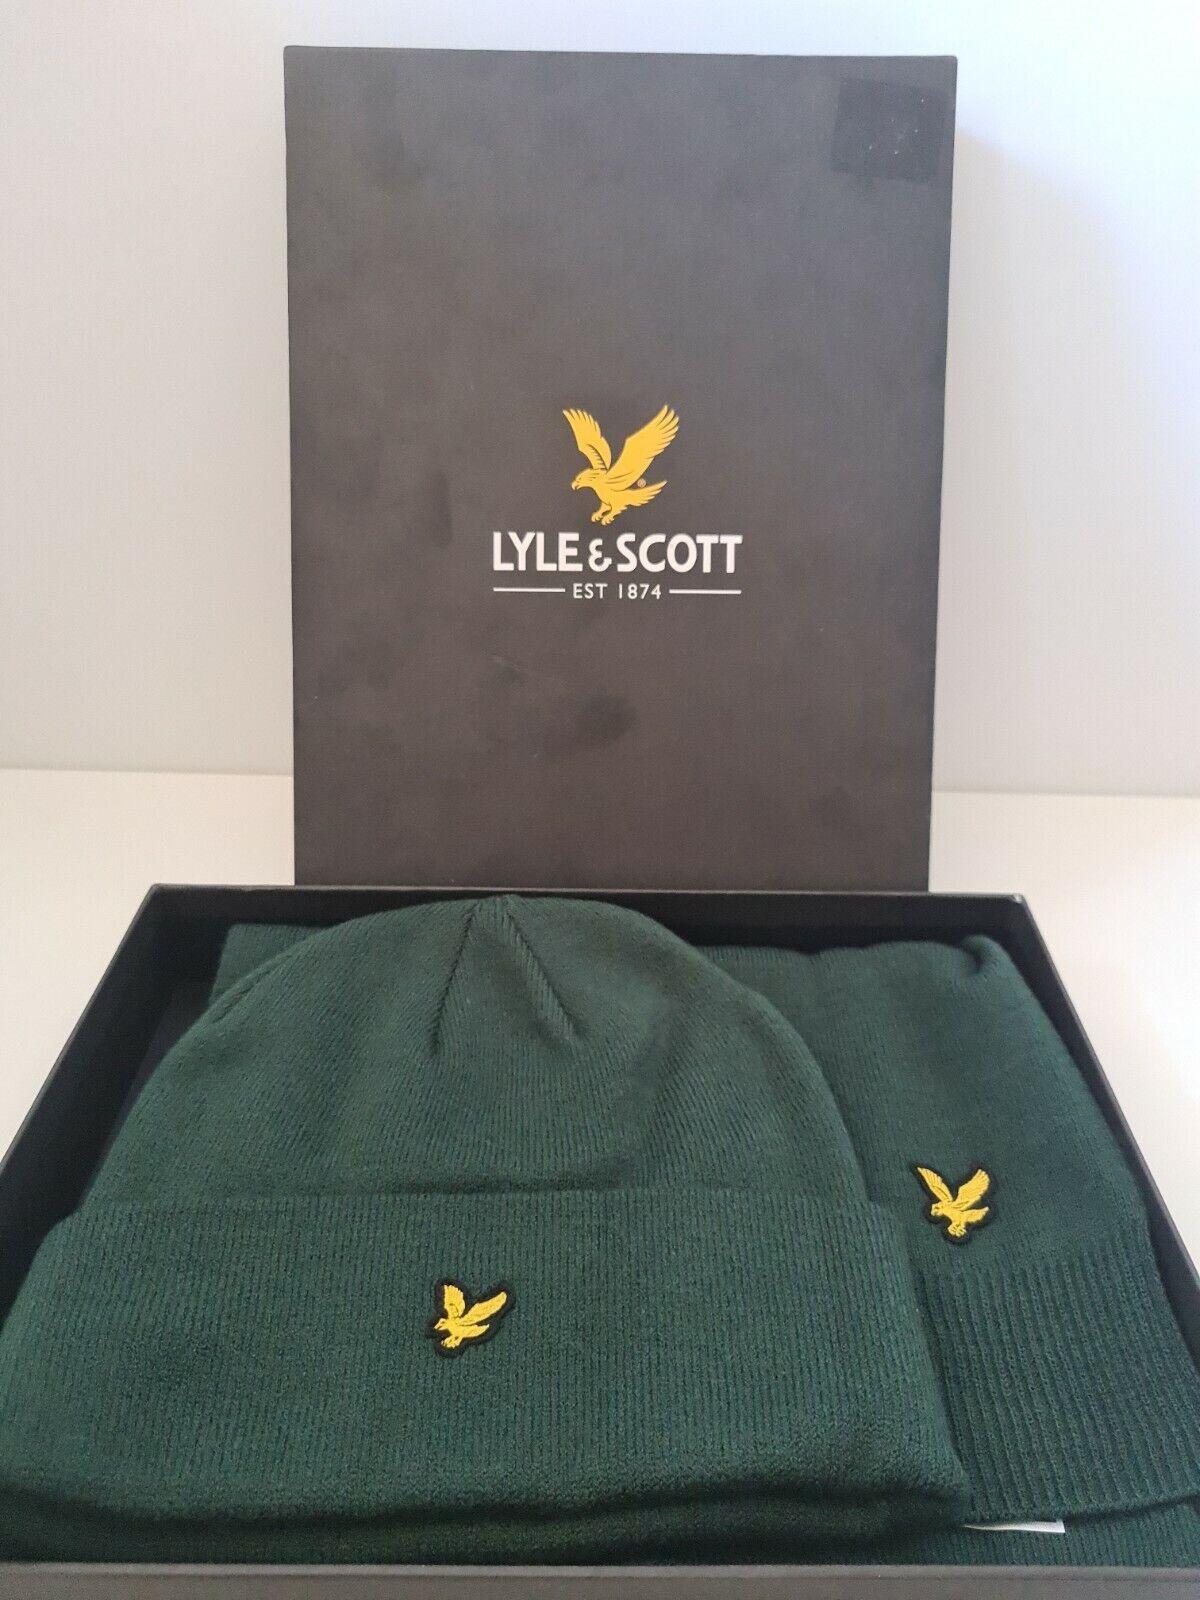 BNIB Lyle & Scott Hat and Scarf Boxed Gift Set GREEN 1SZ RRP GF900A 572